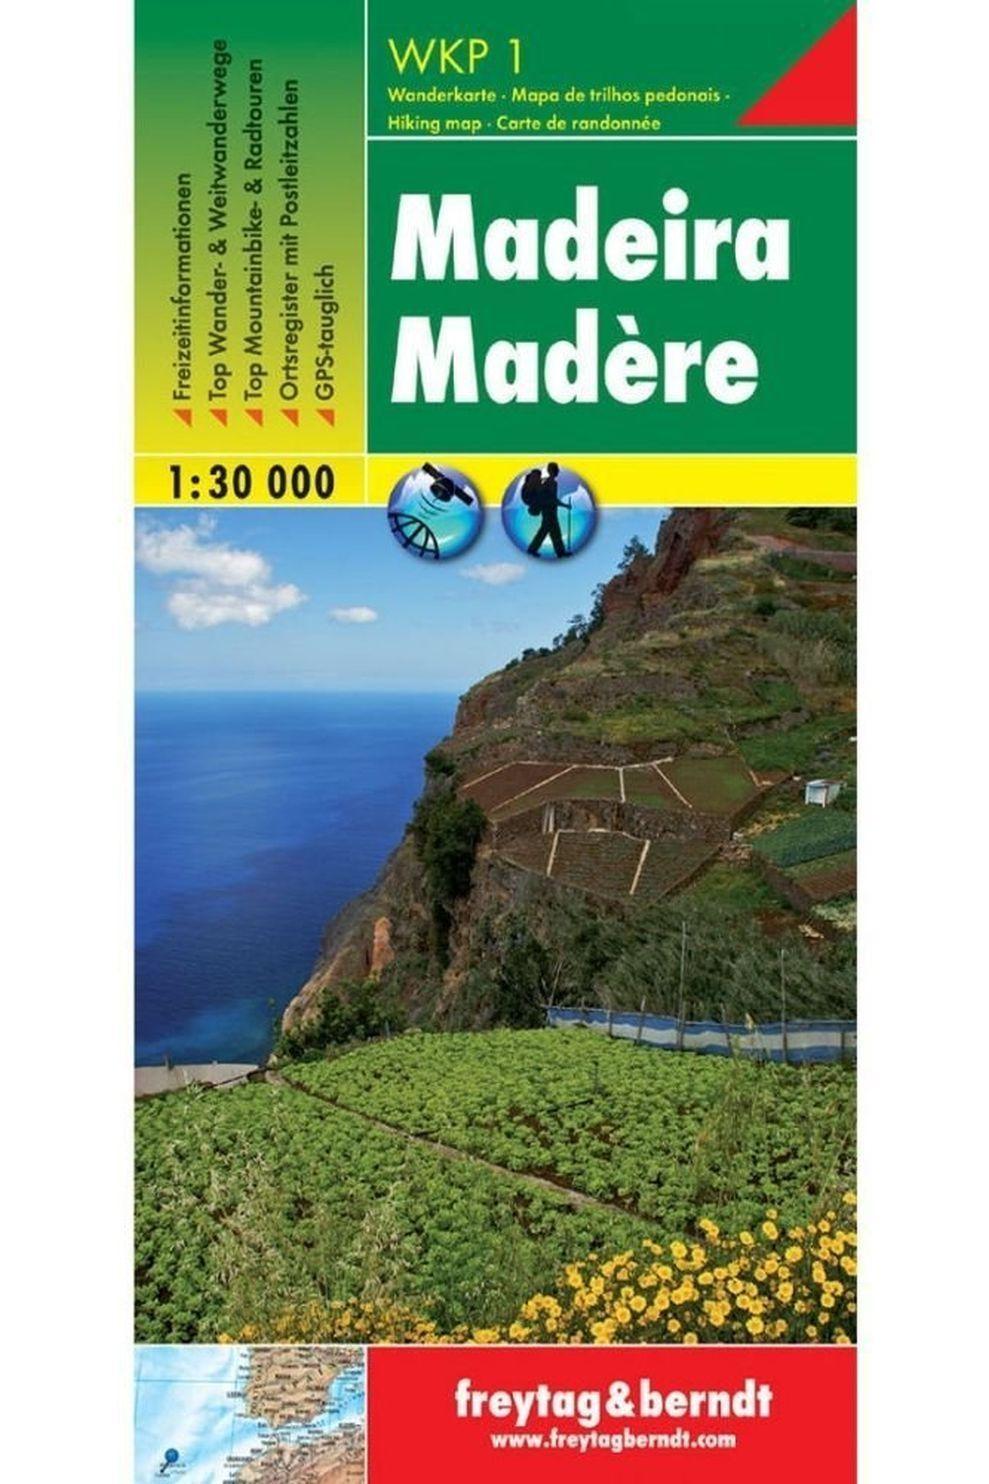 Freytag & Berndt Livre De Voyage Madeira F&b Gps Utm (wandel & Fietskaart) - Wkp1